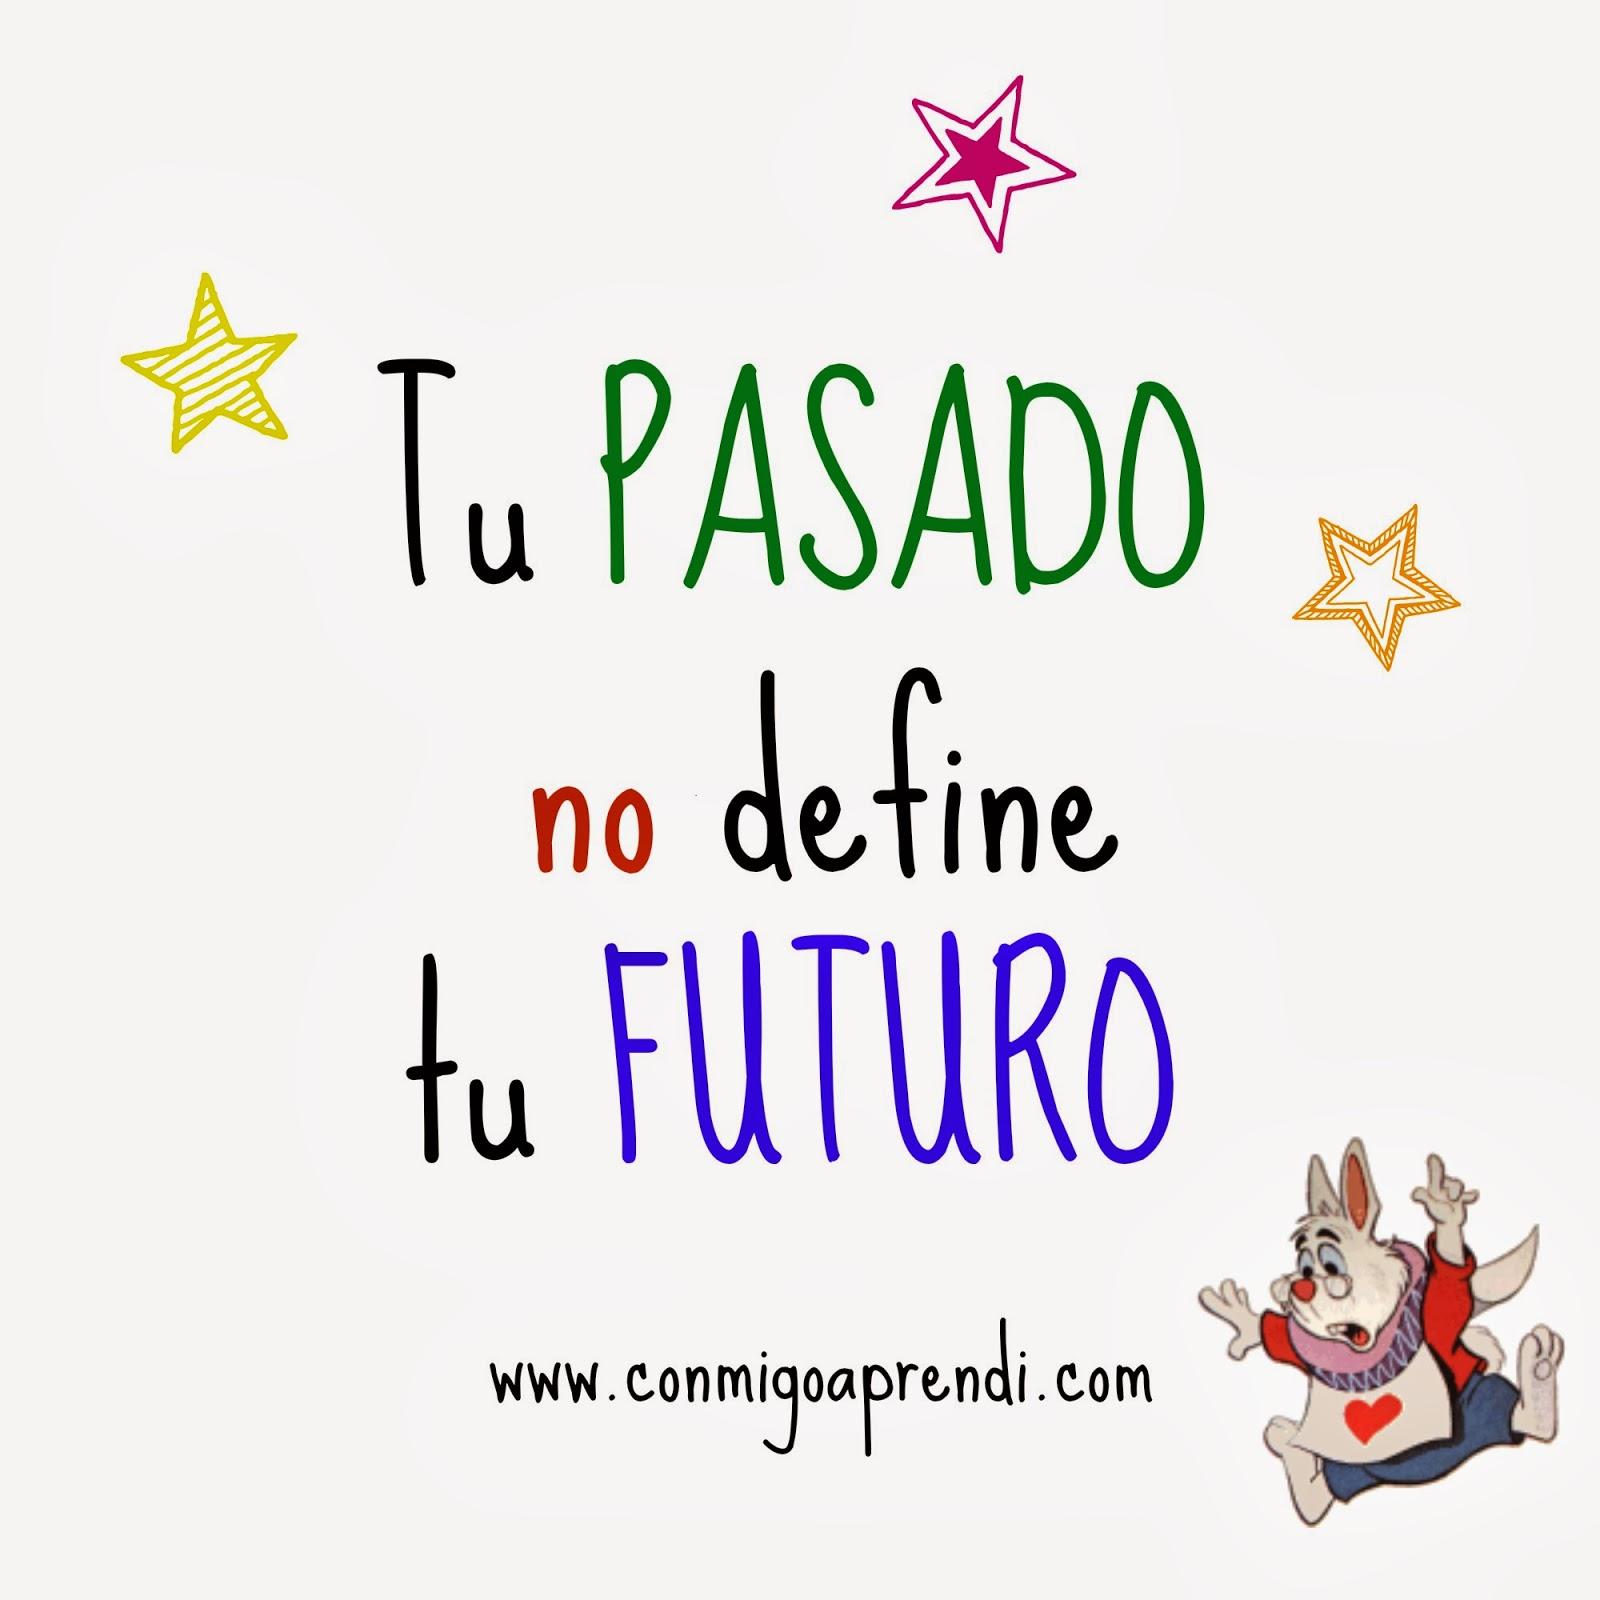 Tu pasado no define tu futuro